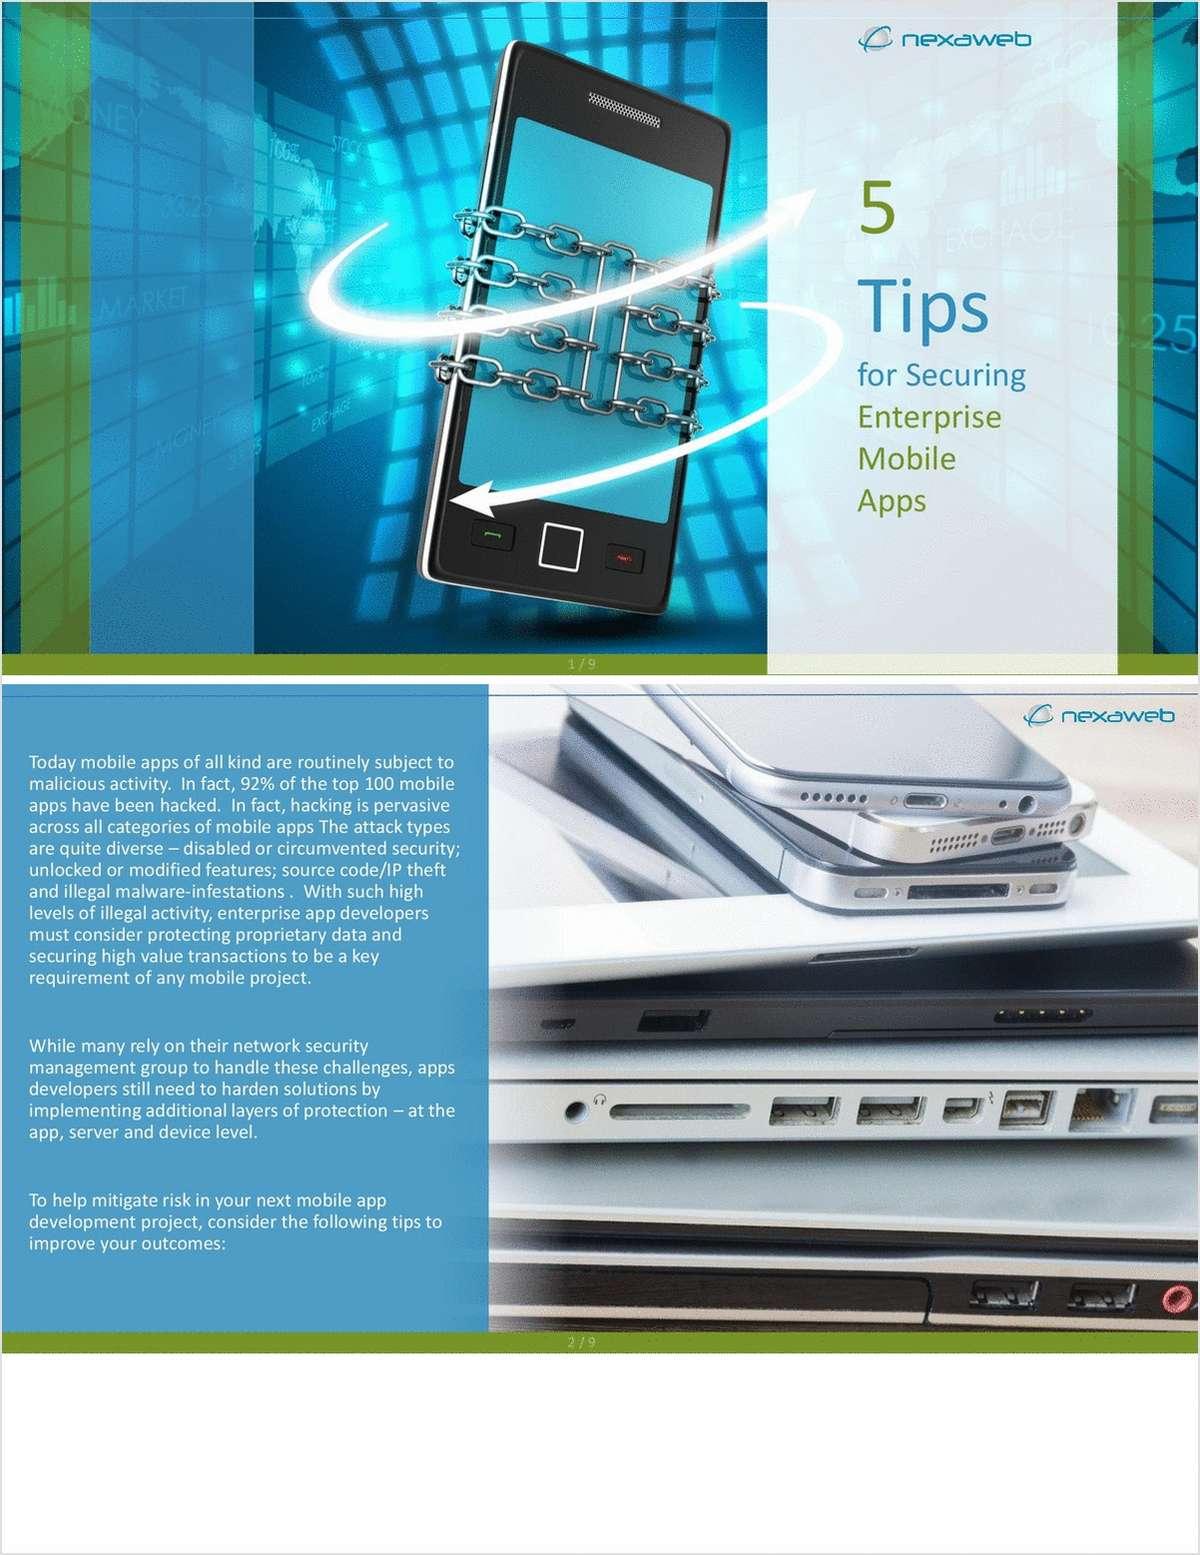 5 Tips for Mitigating Risk in Your Mobile App Development